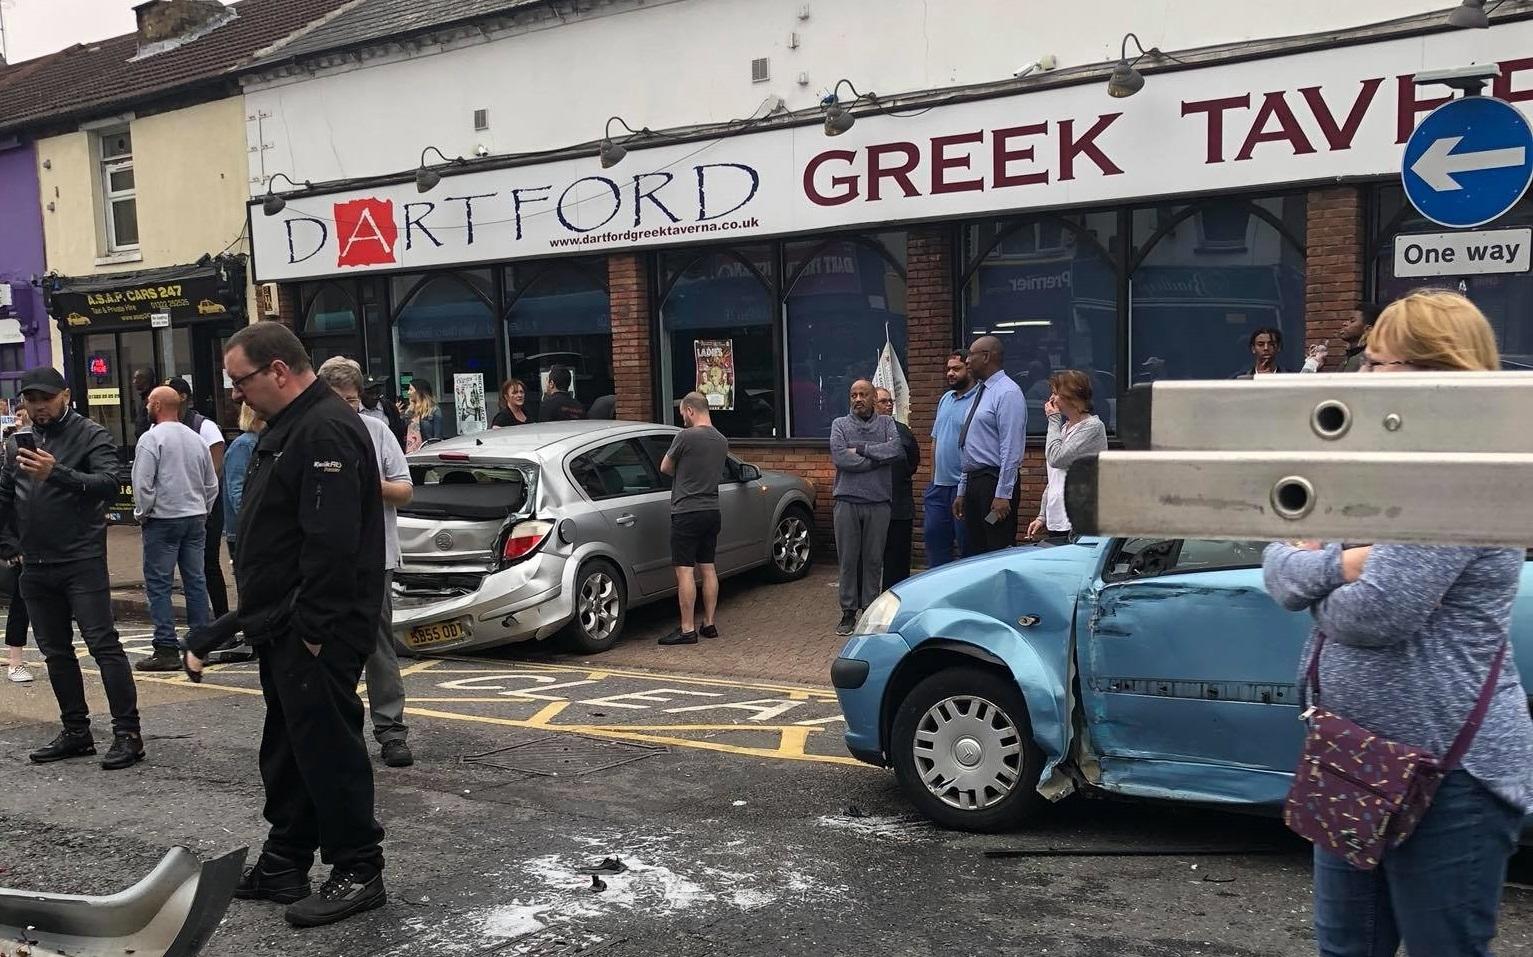 Ecsimgdartford bus crash pics tony brown  284 29 5805131766509116766